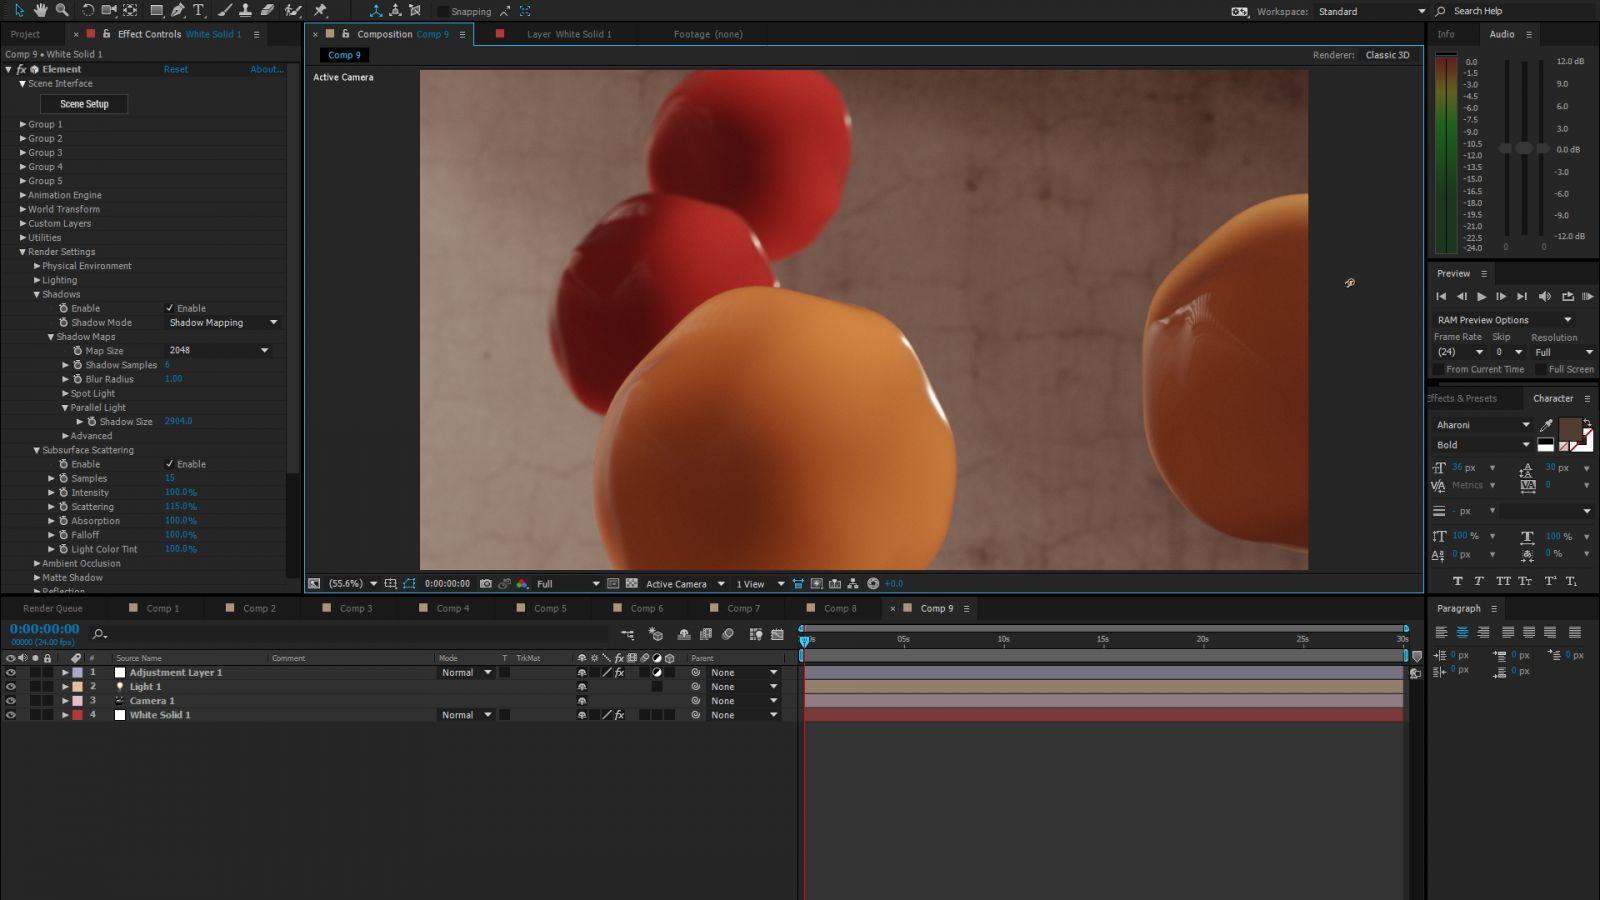 Cinema 4d R19 Crack Plus Keygen For [Win+Mac] Latest Version Free Download